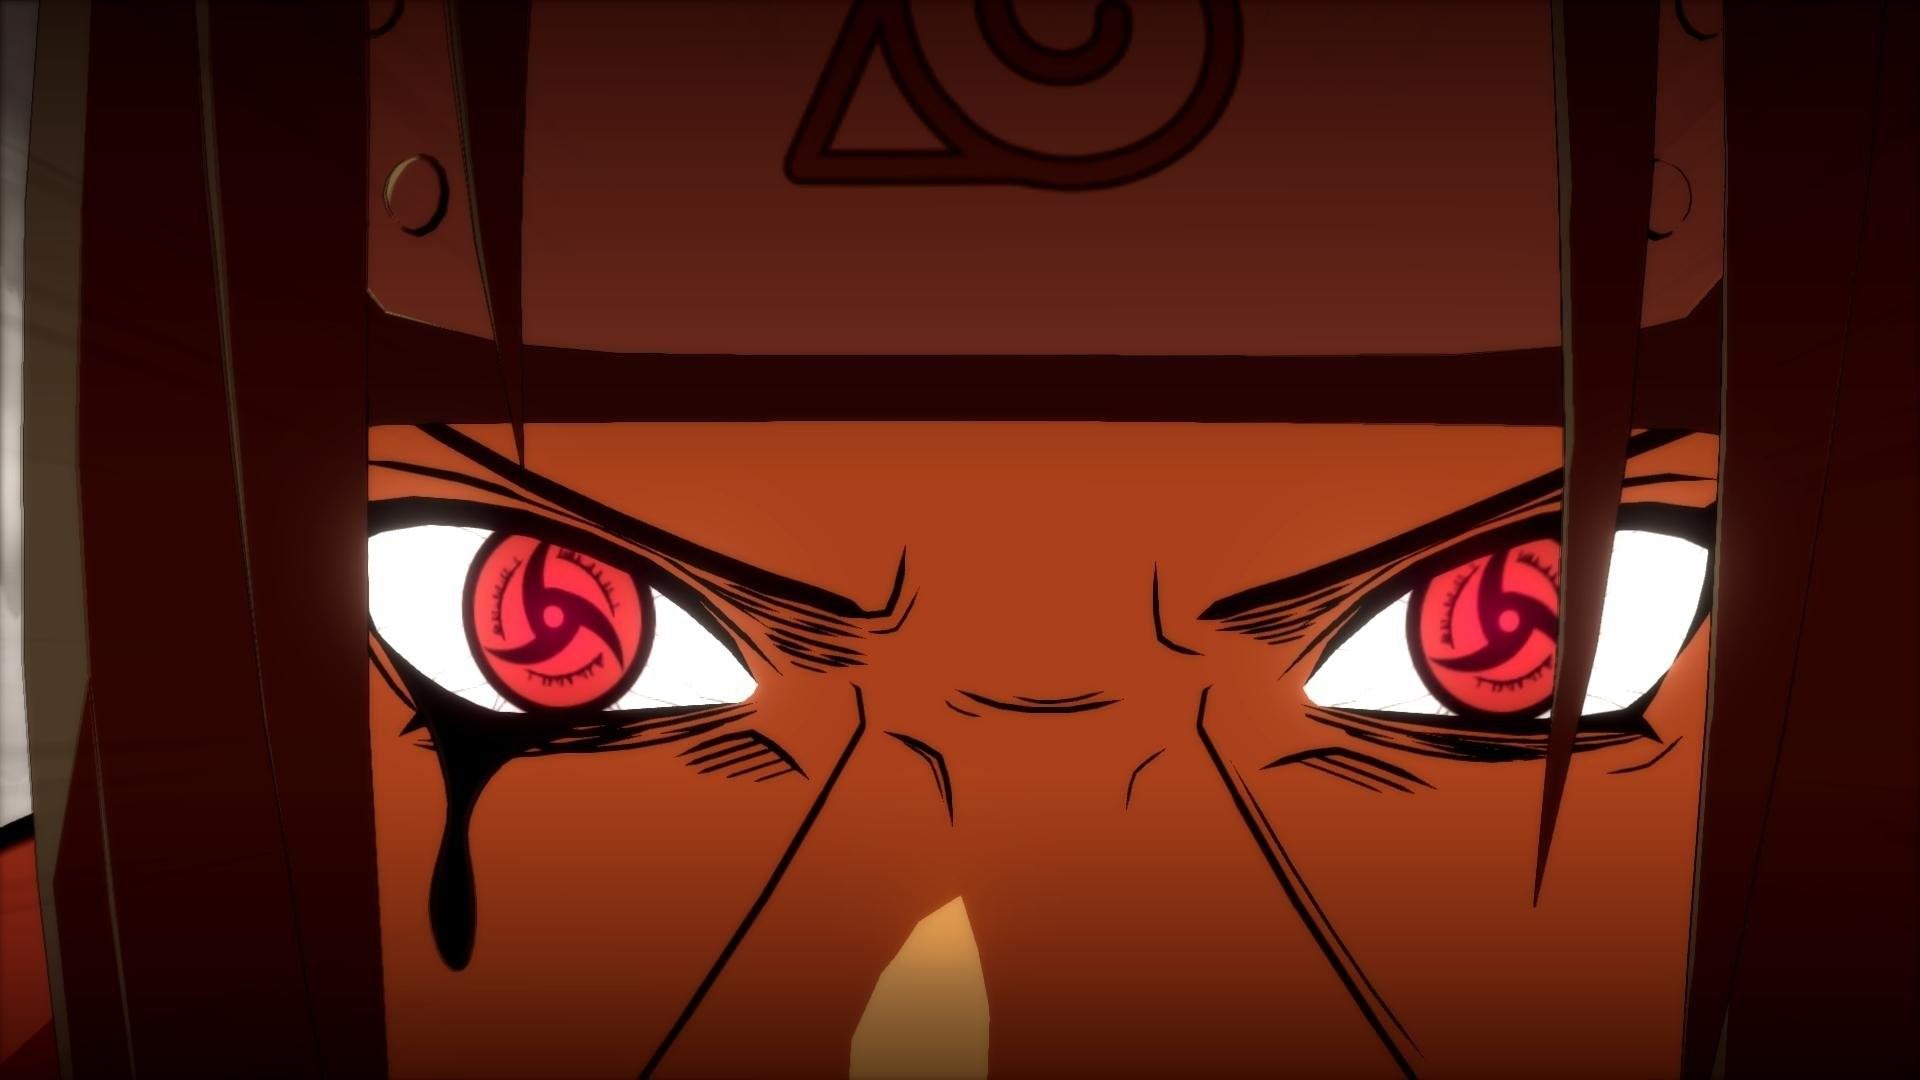 Video Game – Naruto Shippuden: Ultimate Ninja Storm 4 Itachi Uchiha  Wallpaper